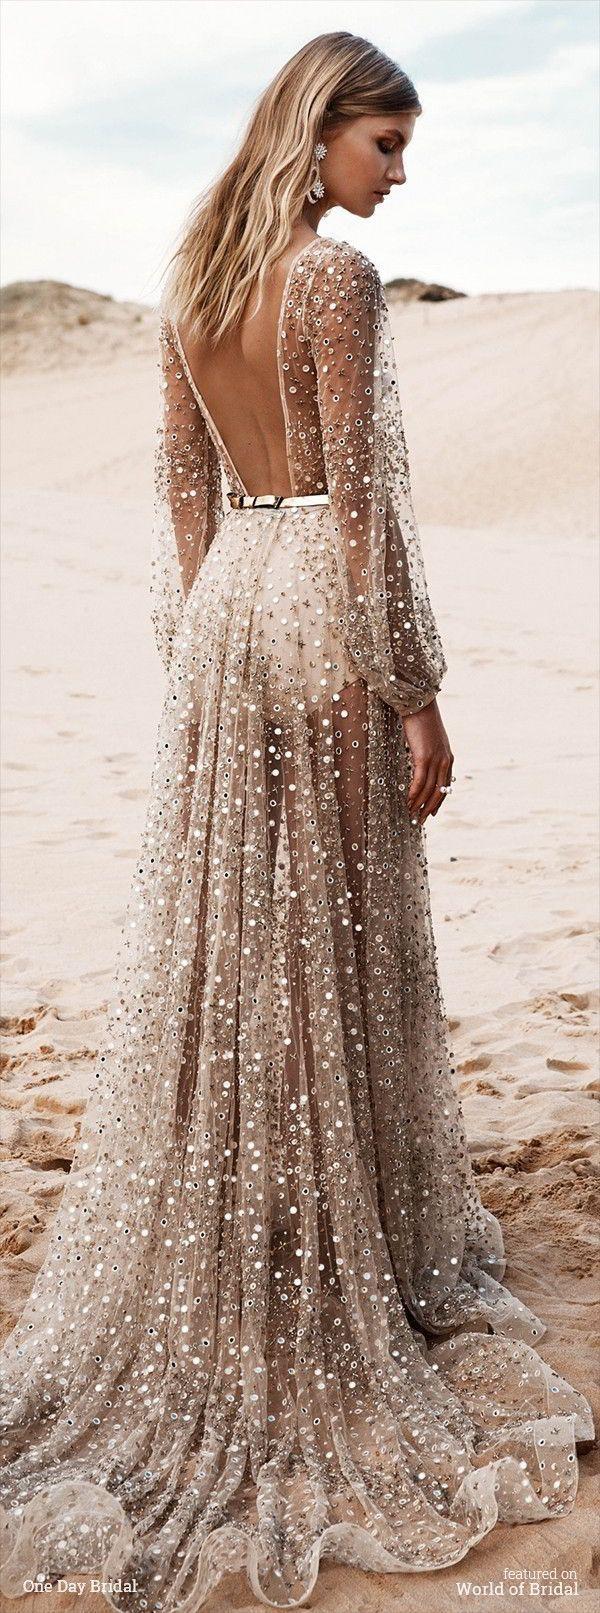 Bellas wedding dress  Resume Templates BUNDLE for Ms Word  Professional Resume Design